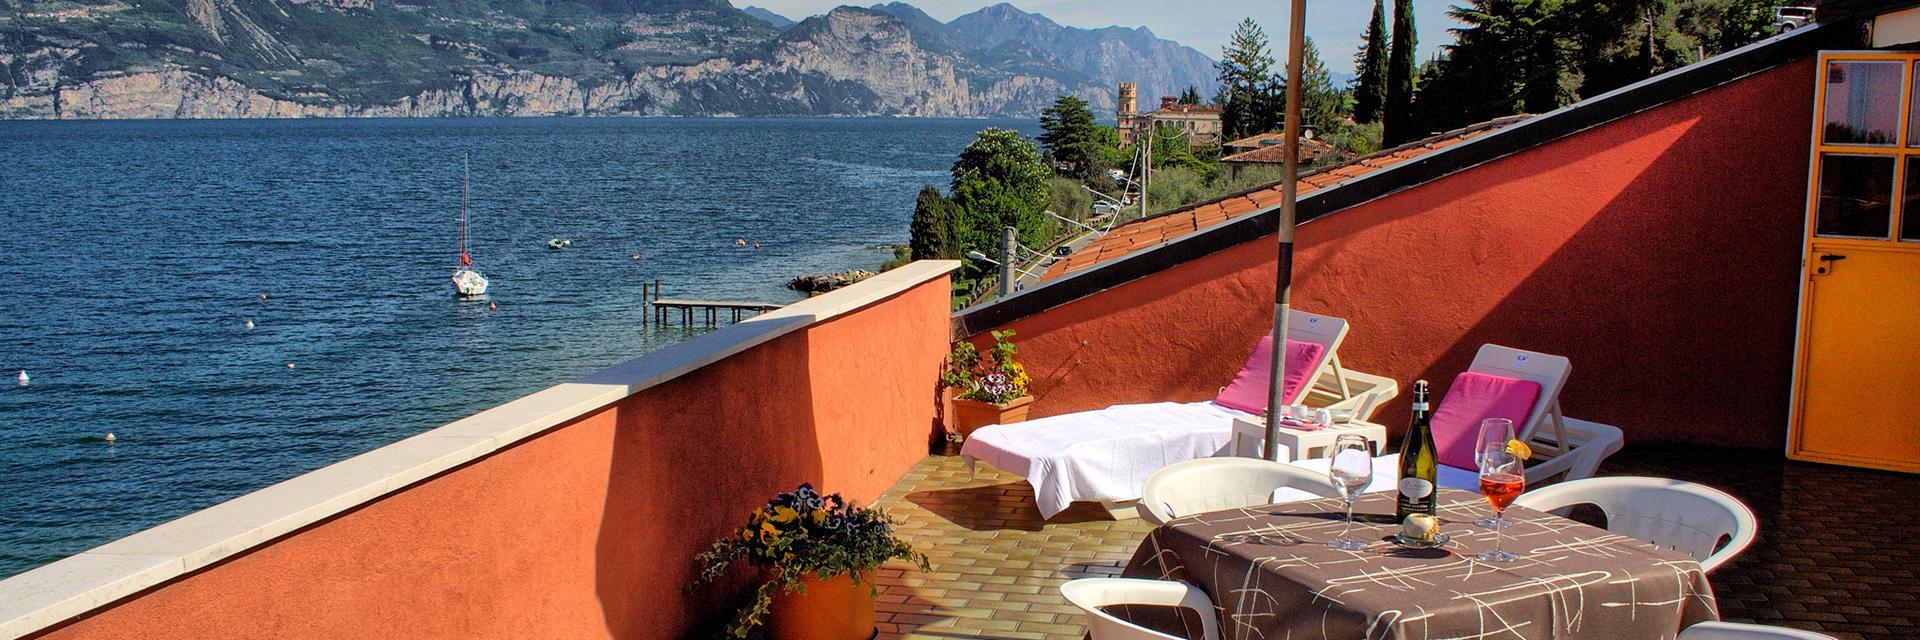 hotel-ristorante-menapace-torri-del-benaco-08.jpg